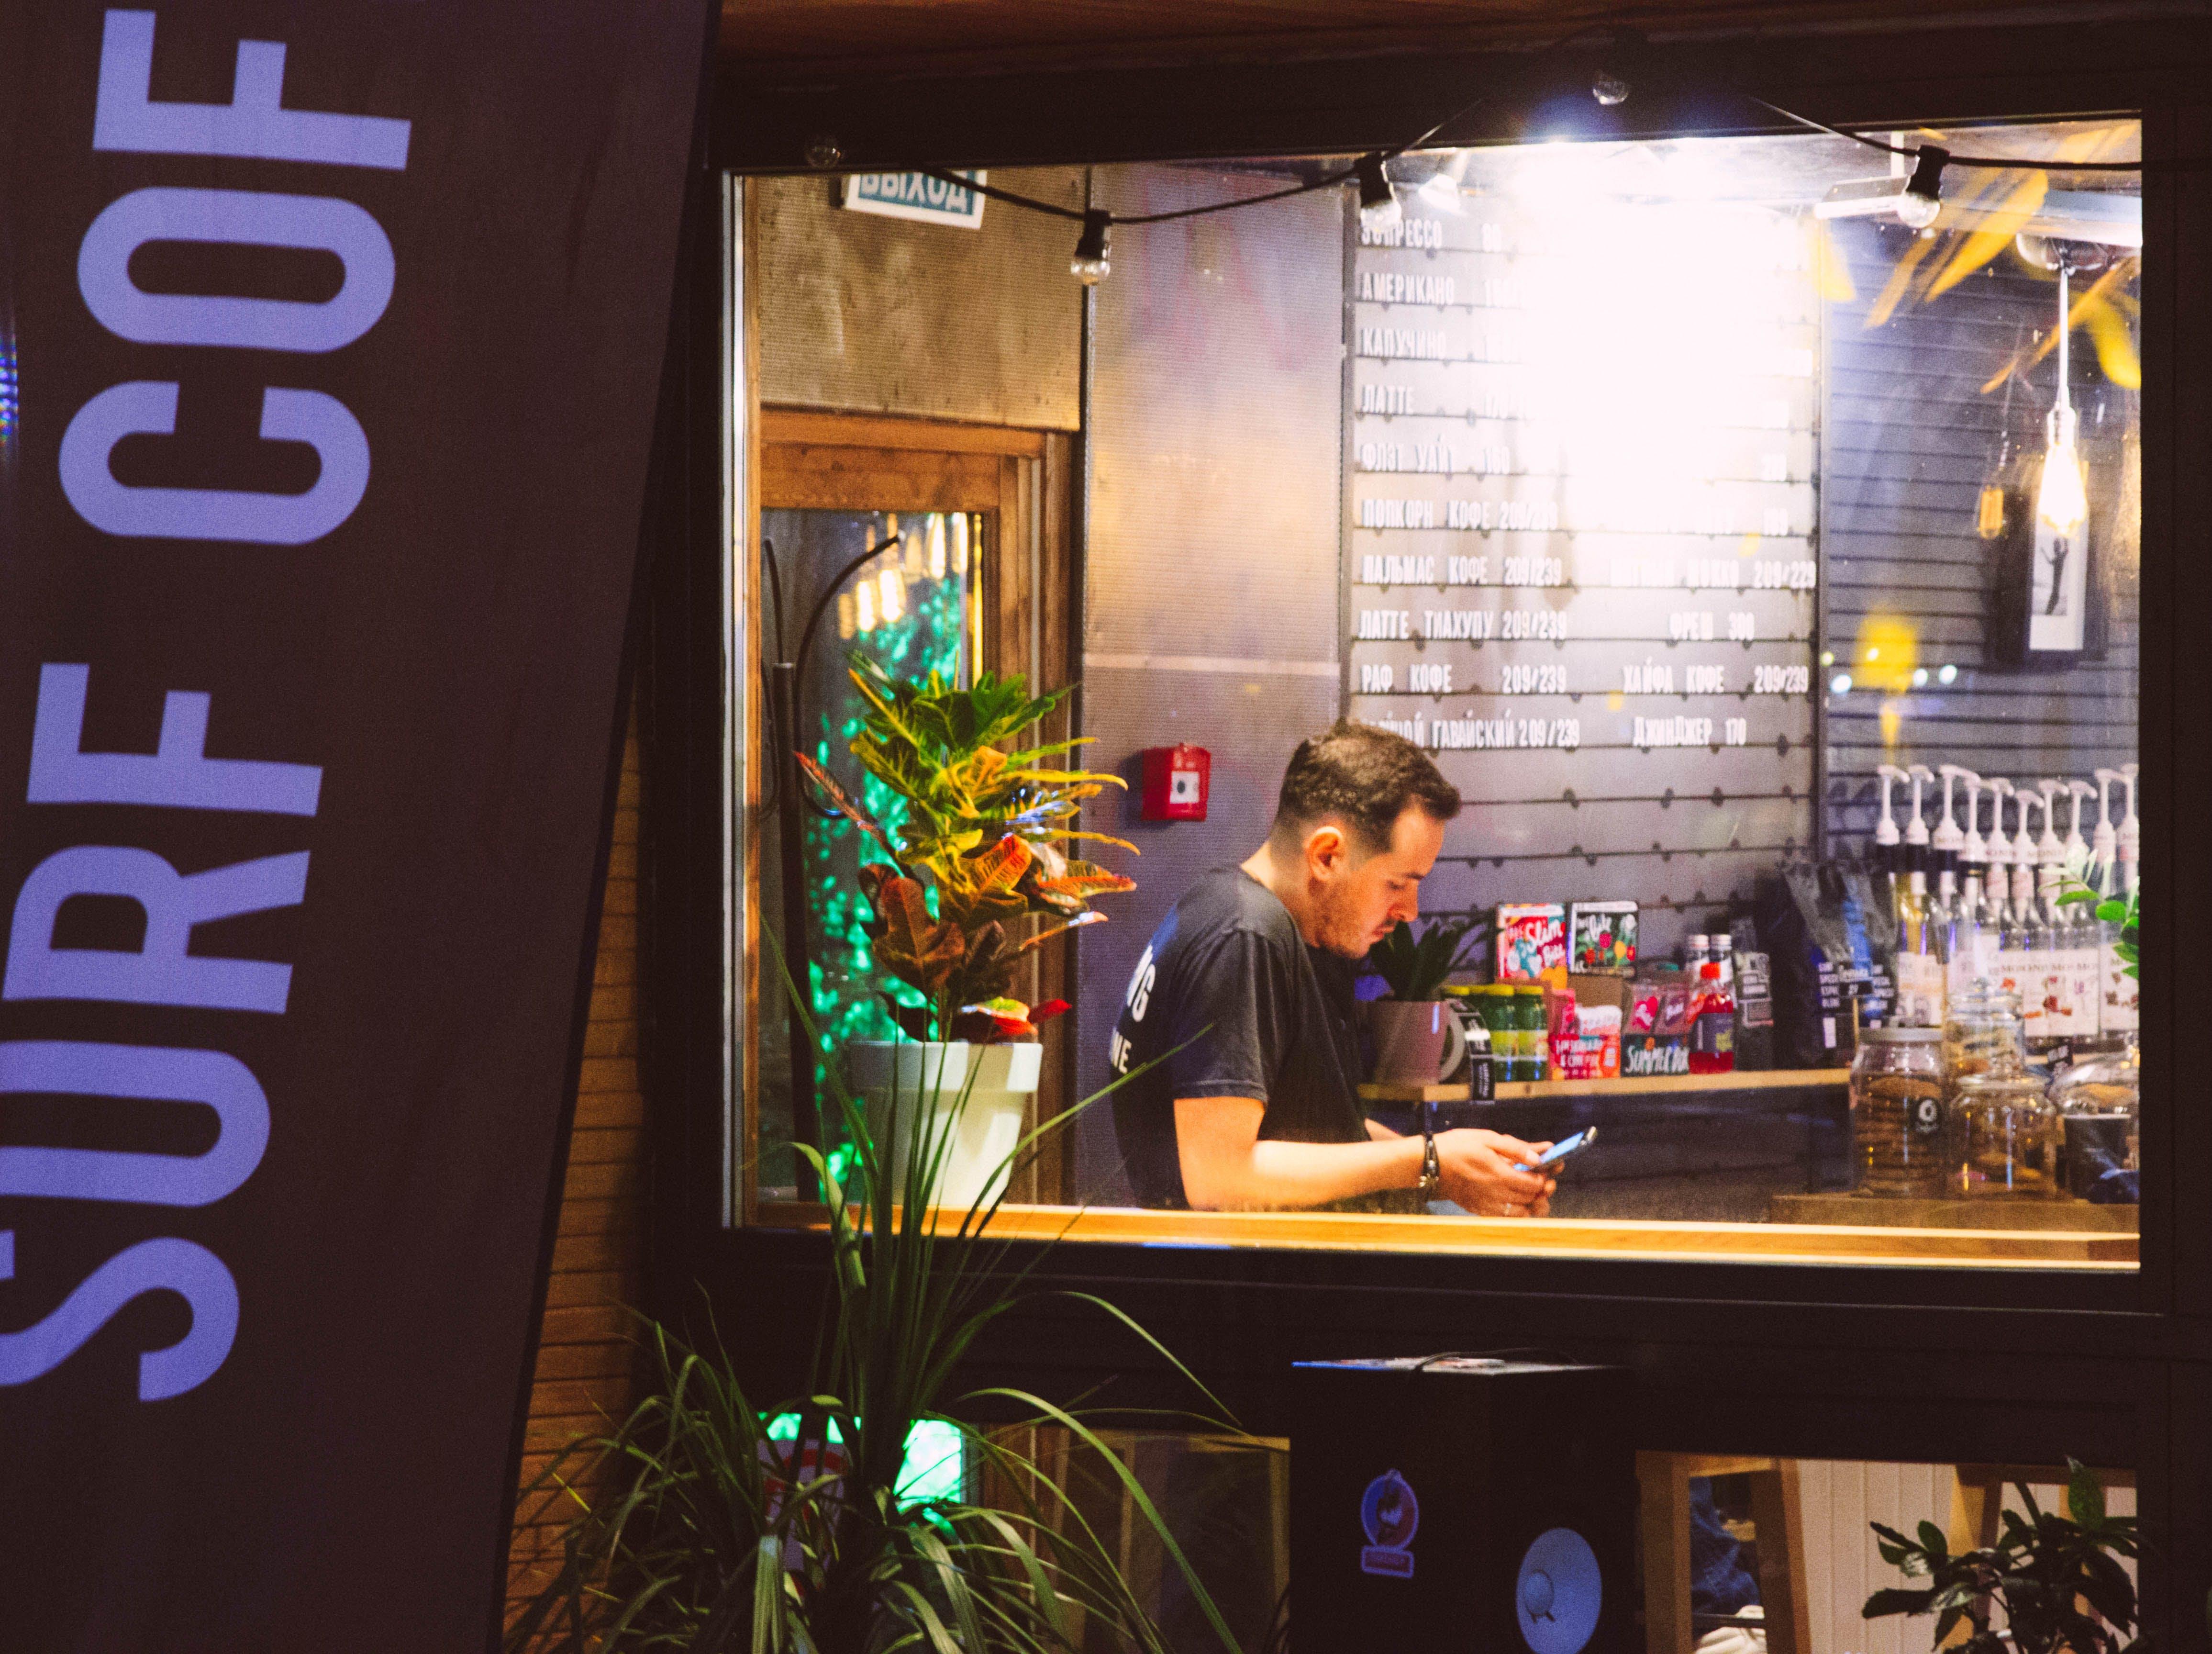 Man Wearing Black Shirt Holding Smartphone Sitting Near Window